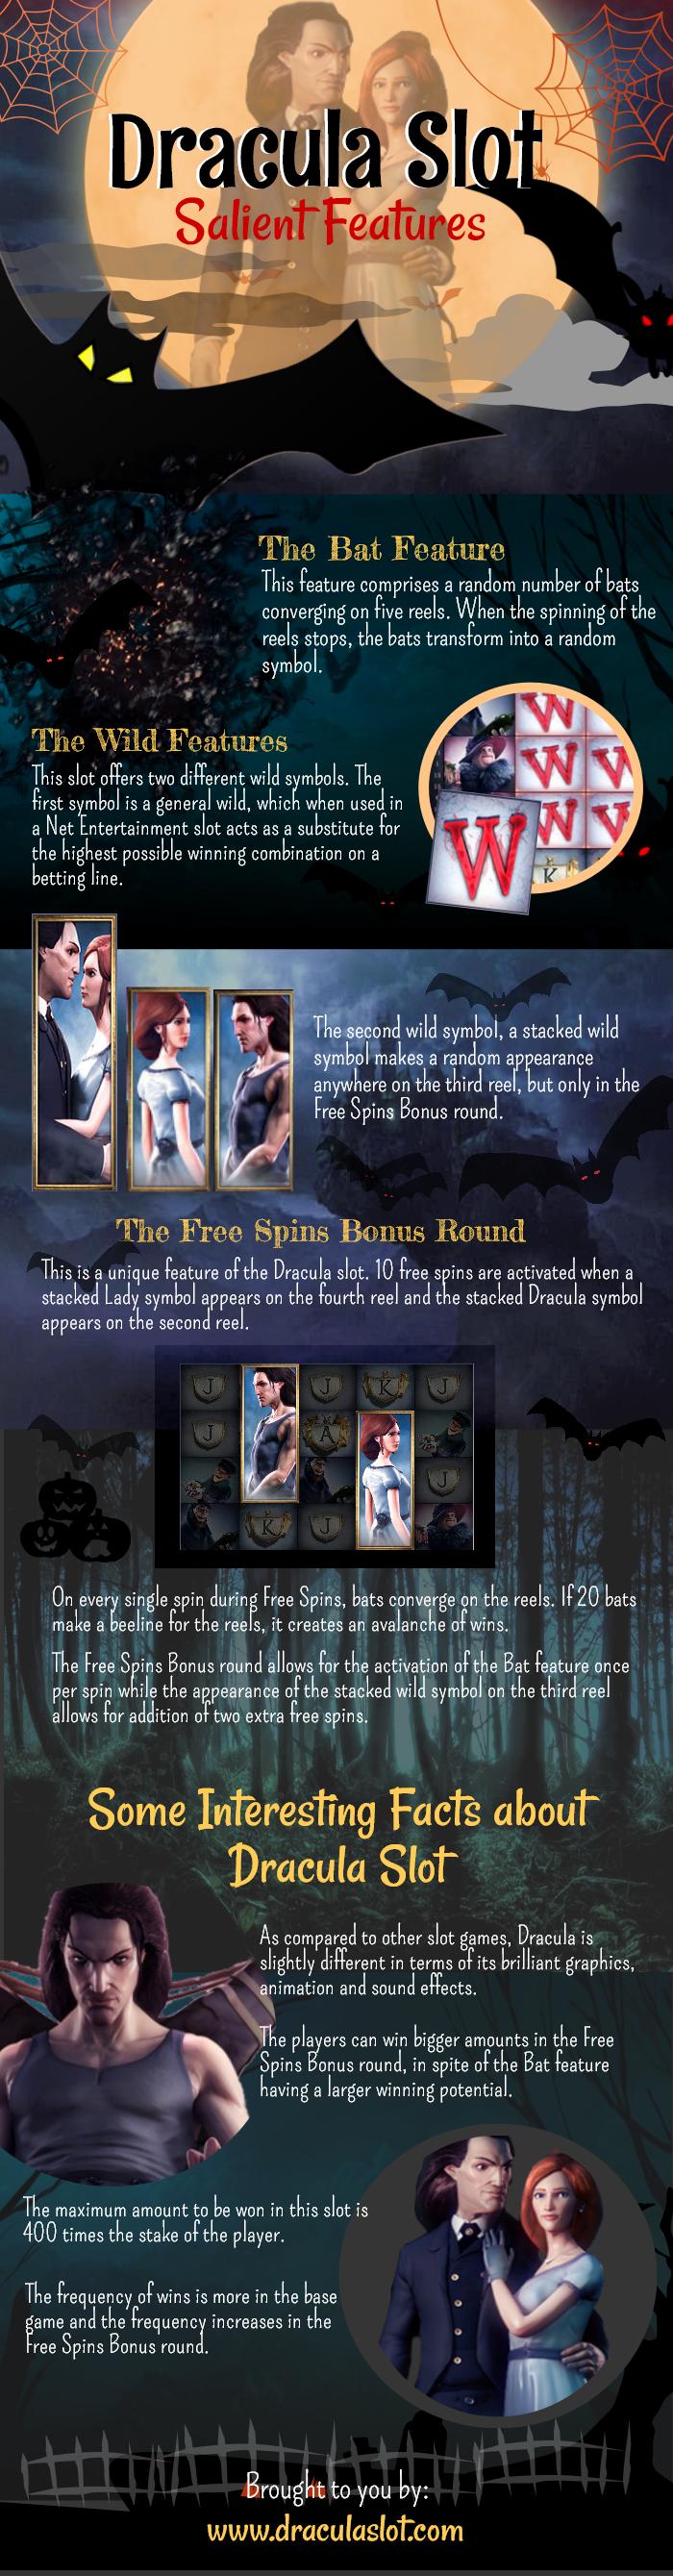 Dracula Slot Bonus Rounds